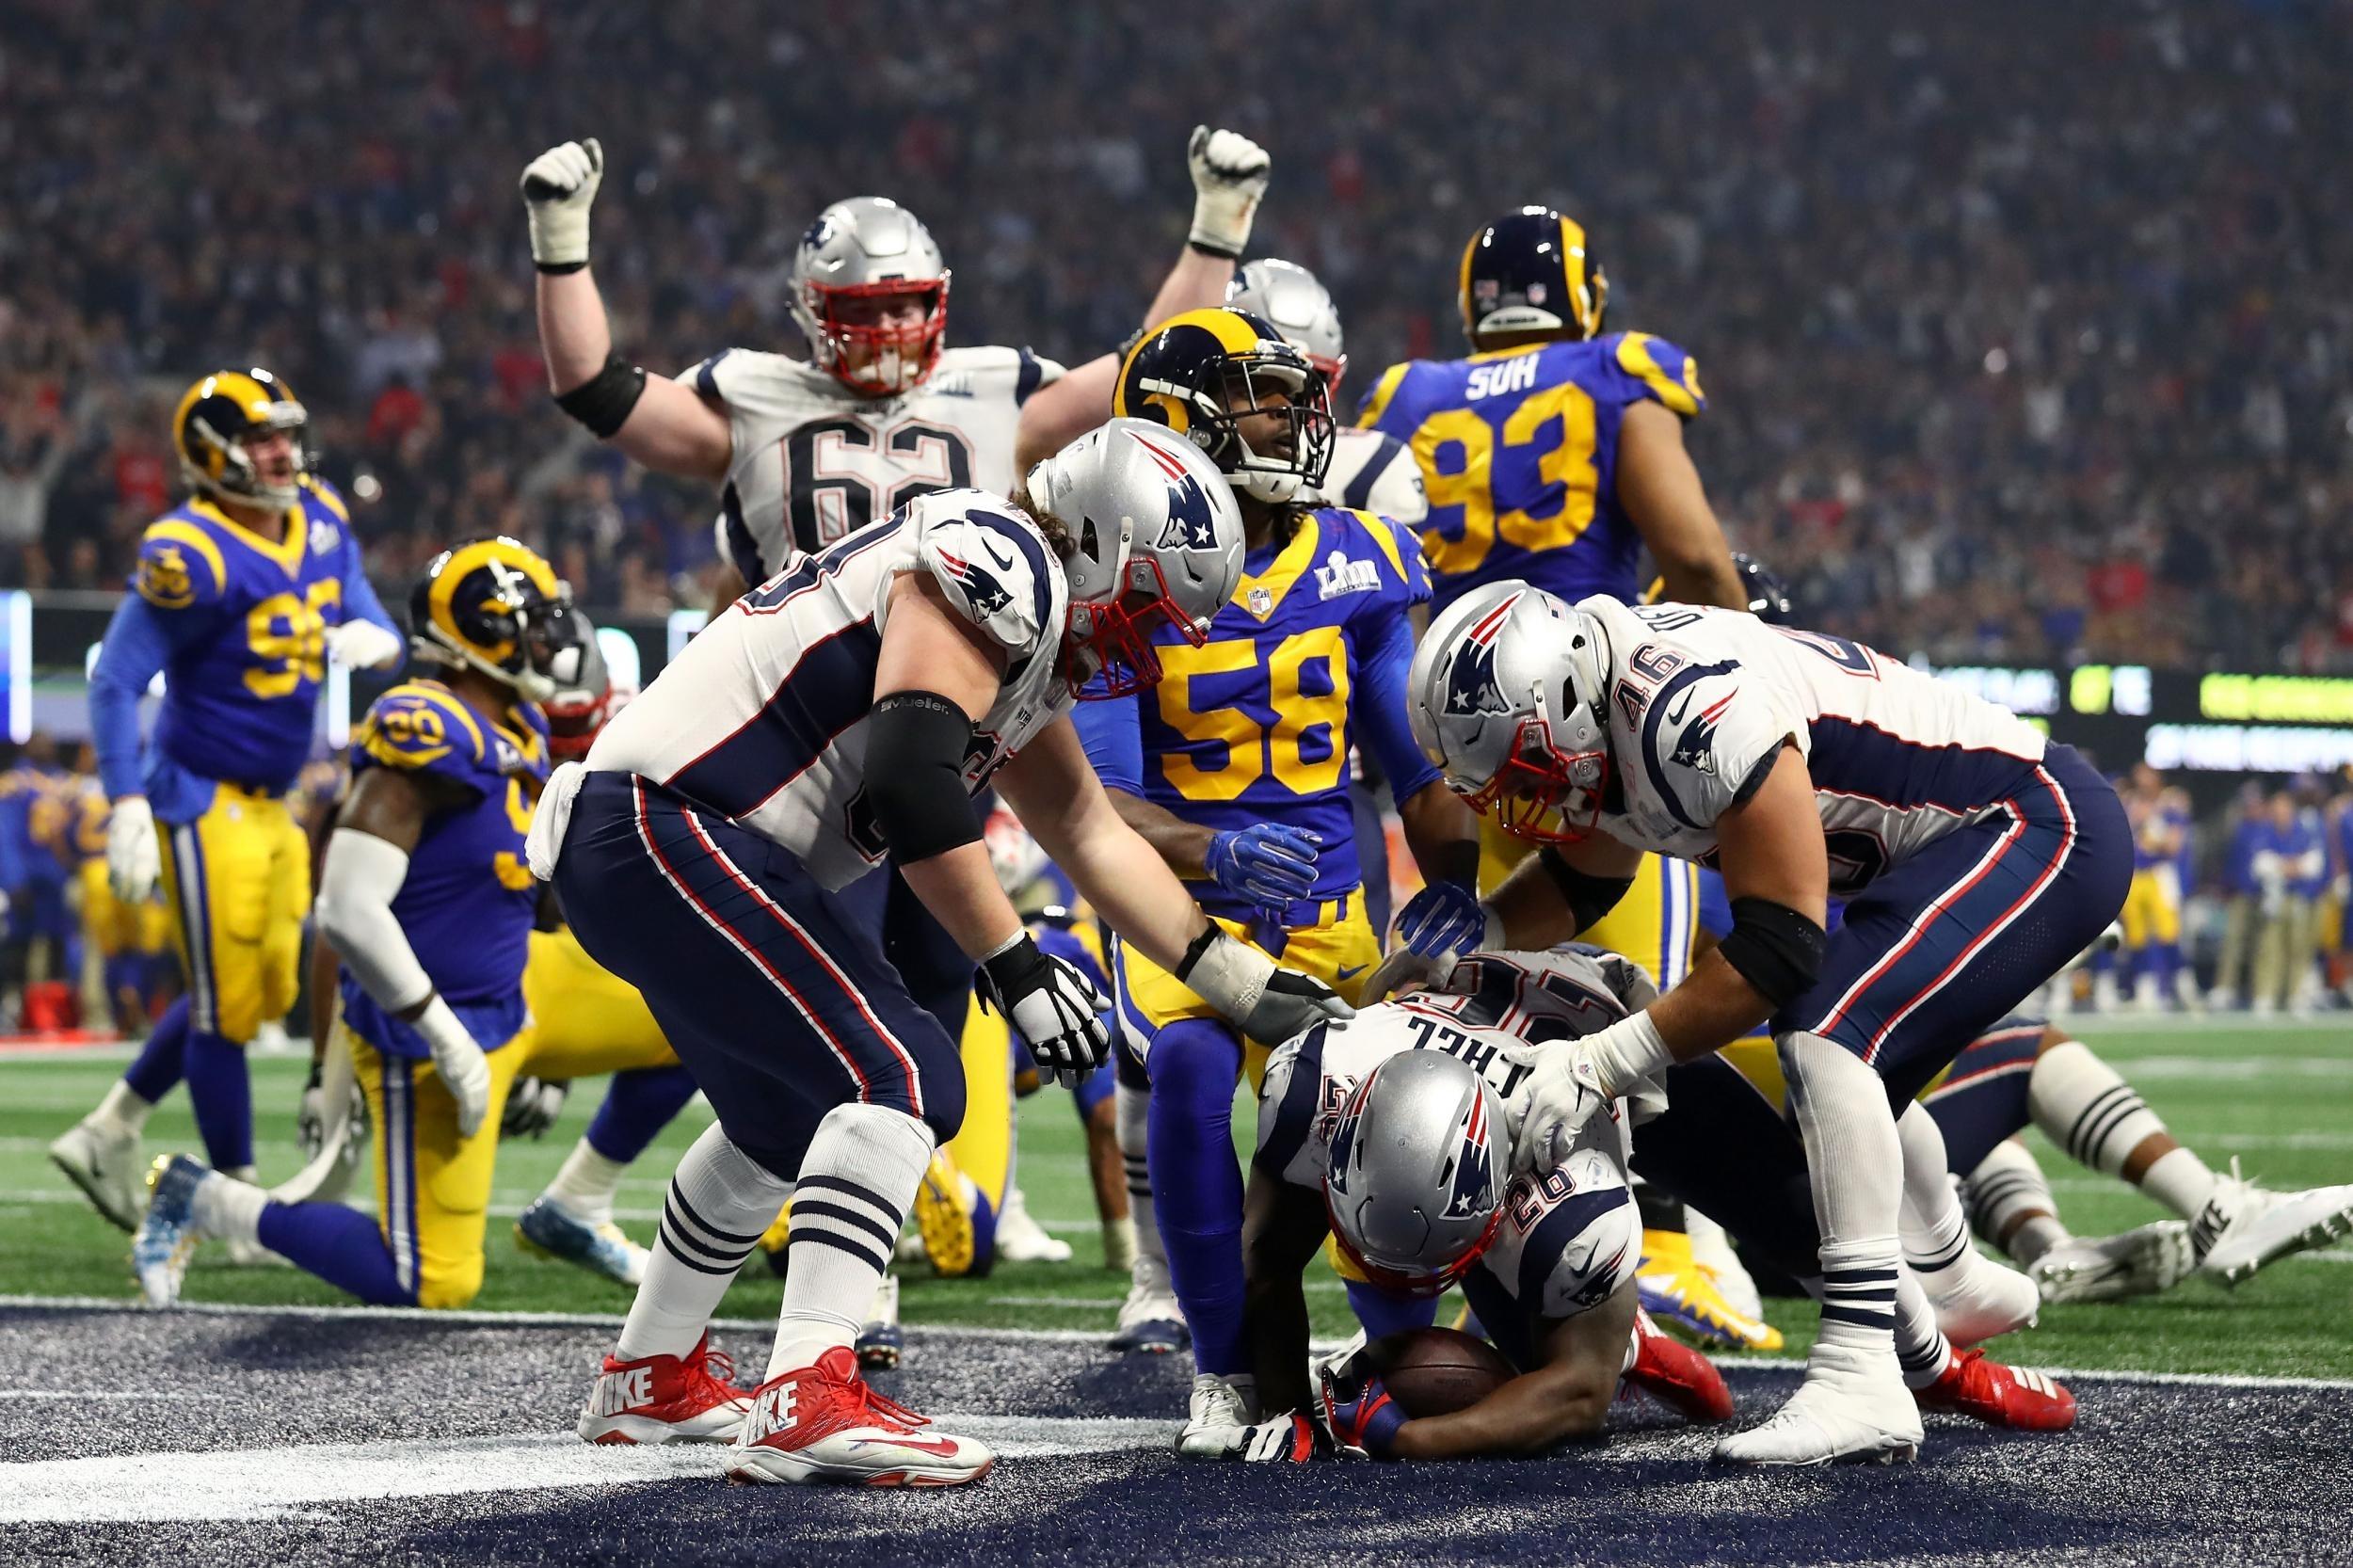 Super Bowl 2019 Attendance: La Rams Vs New England Patriots for Super Bowl Attendance 2019